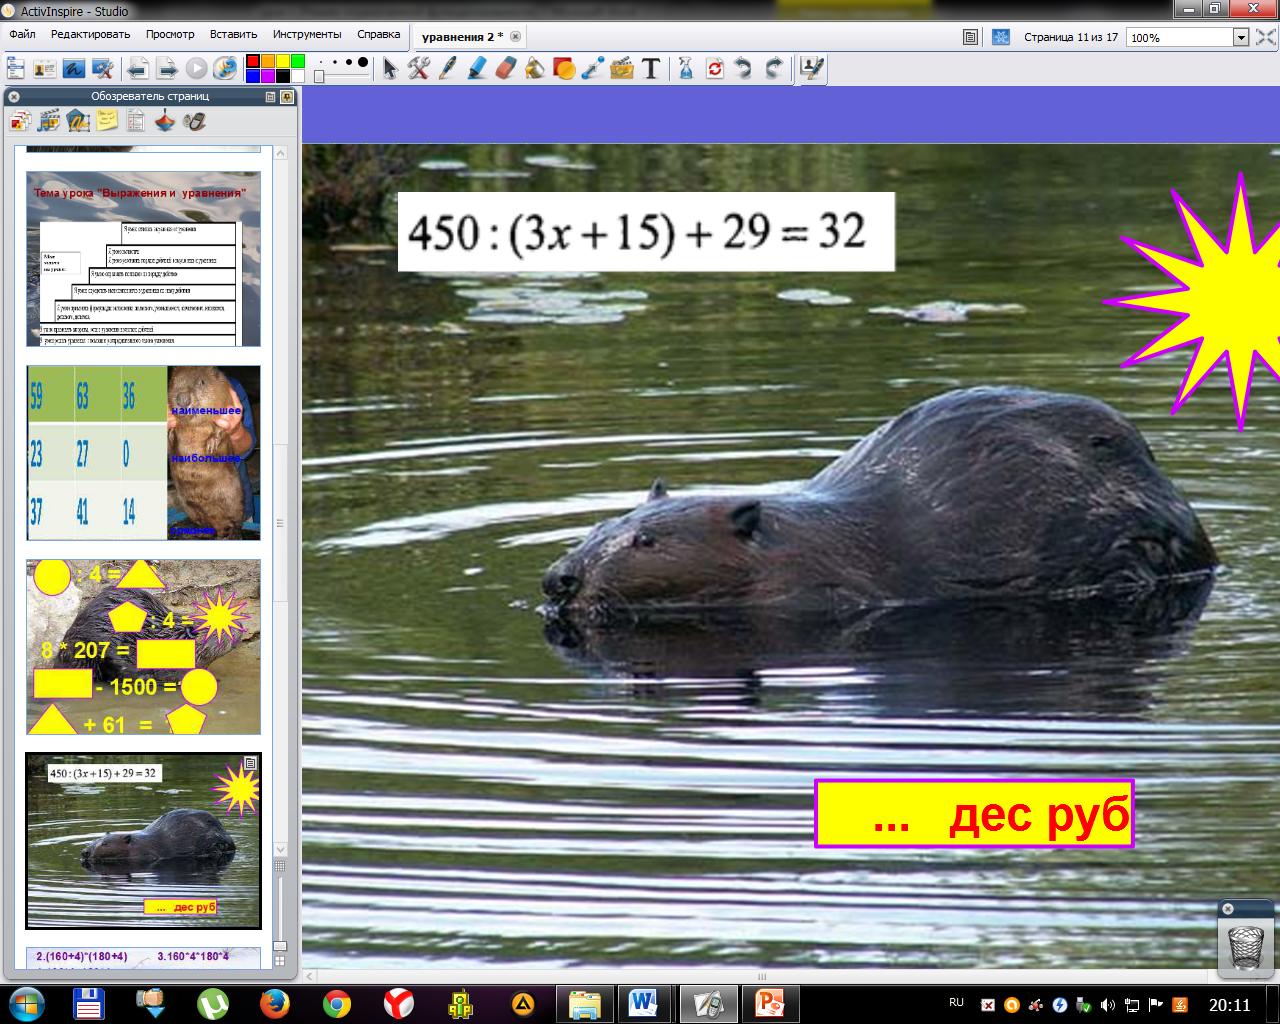 hello_html_md8e3ac.png